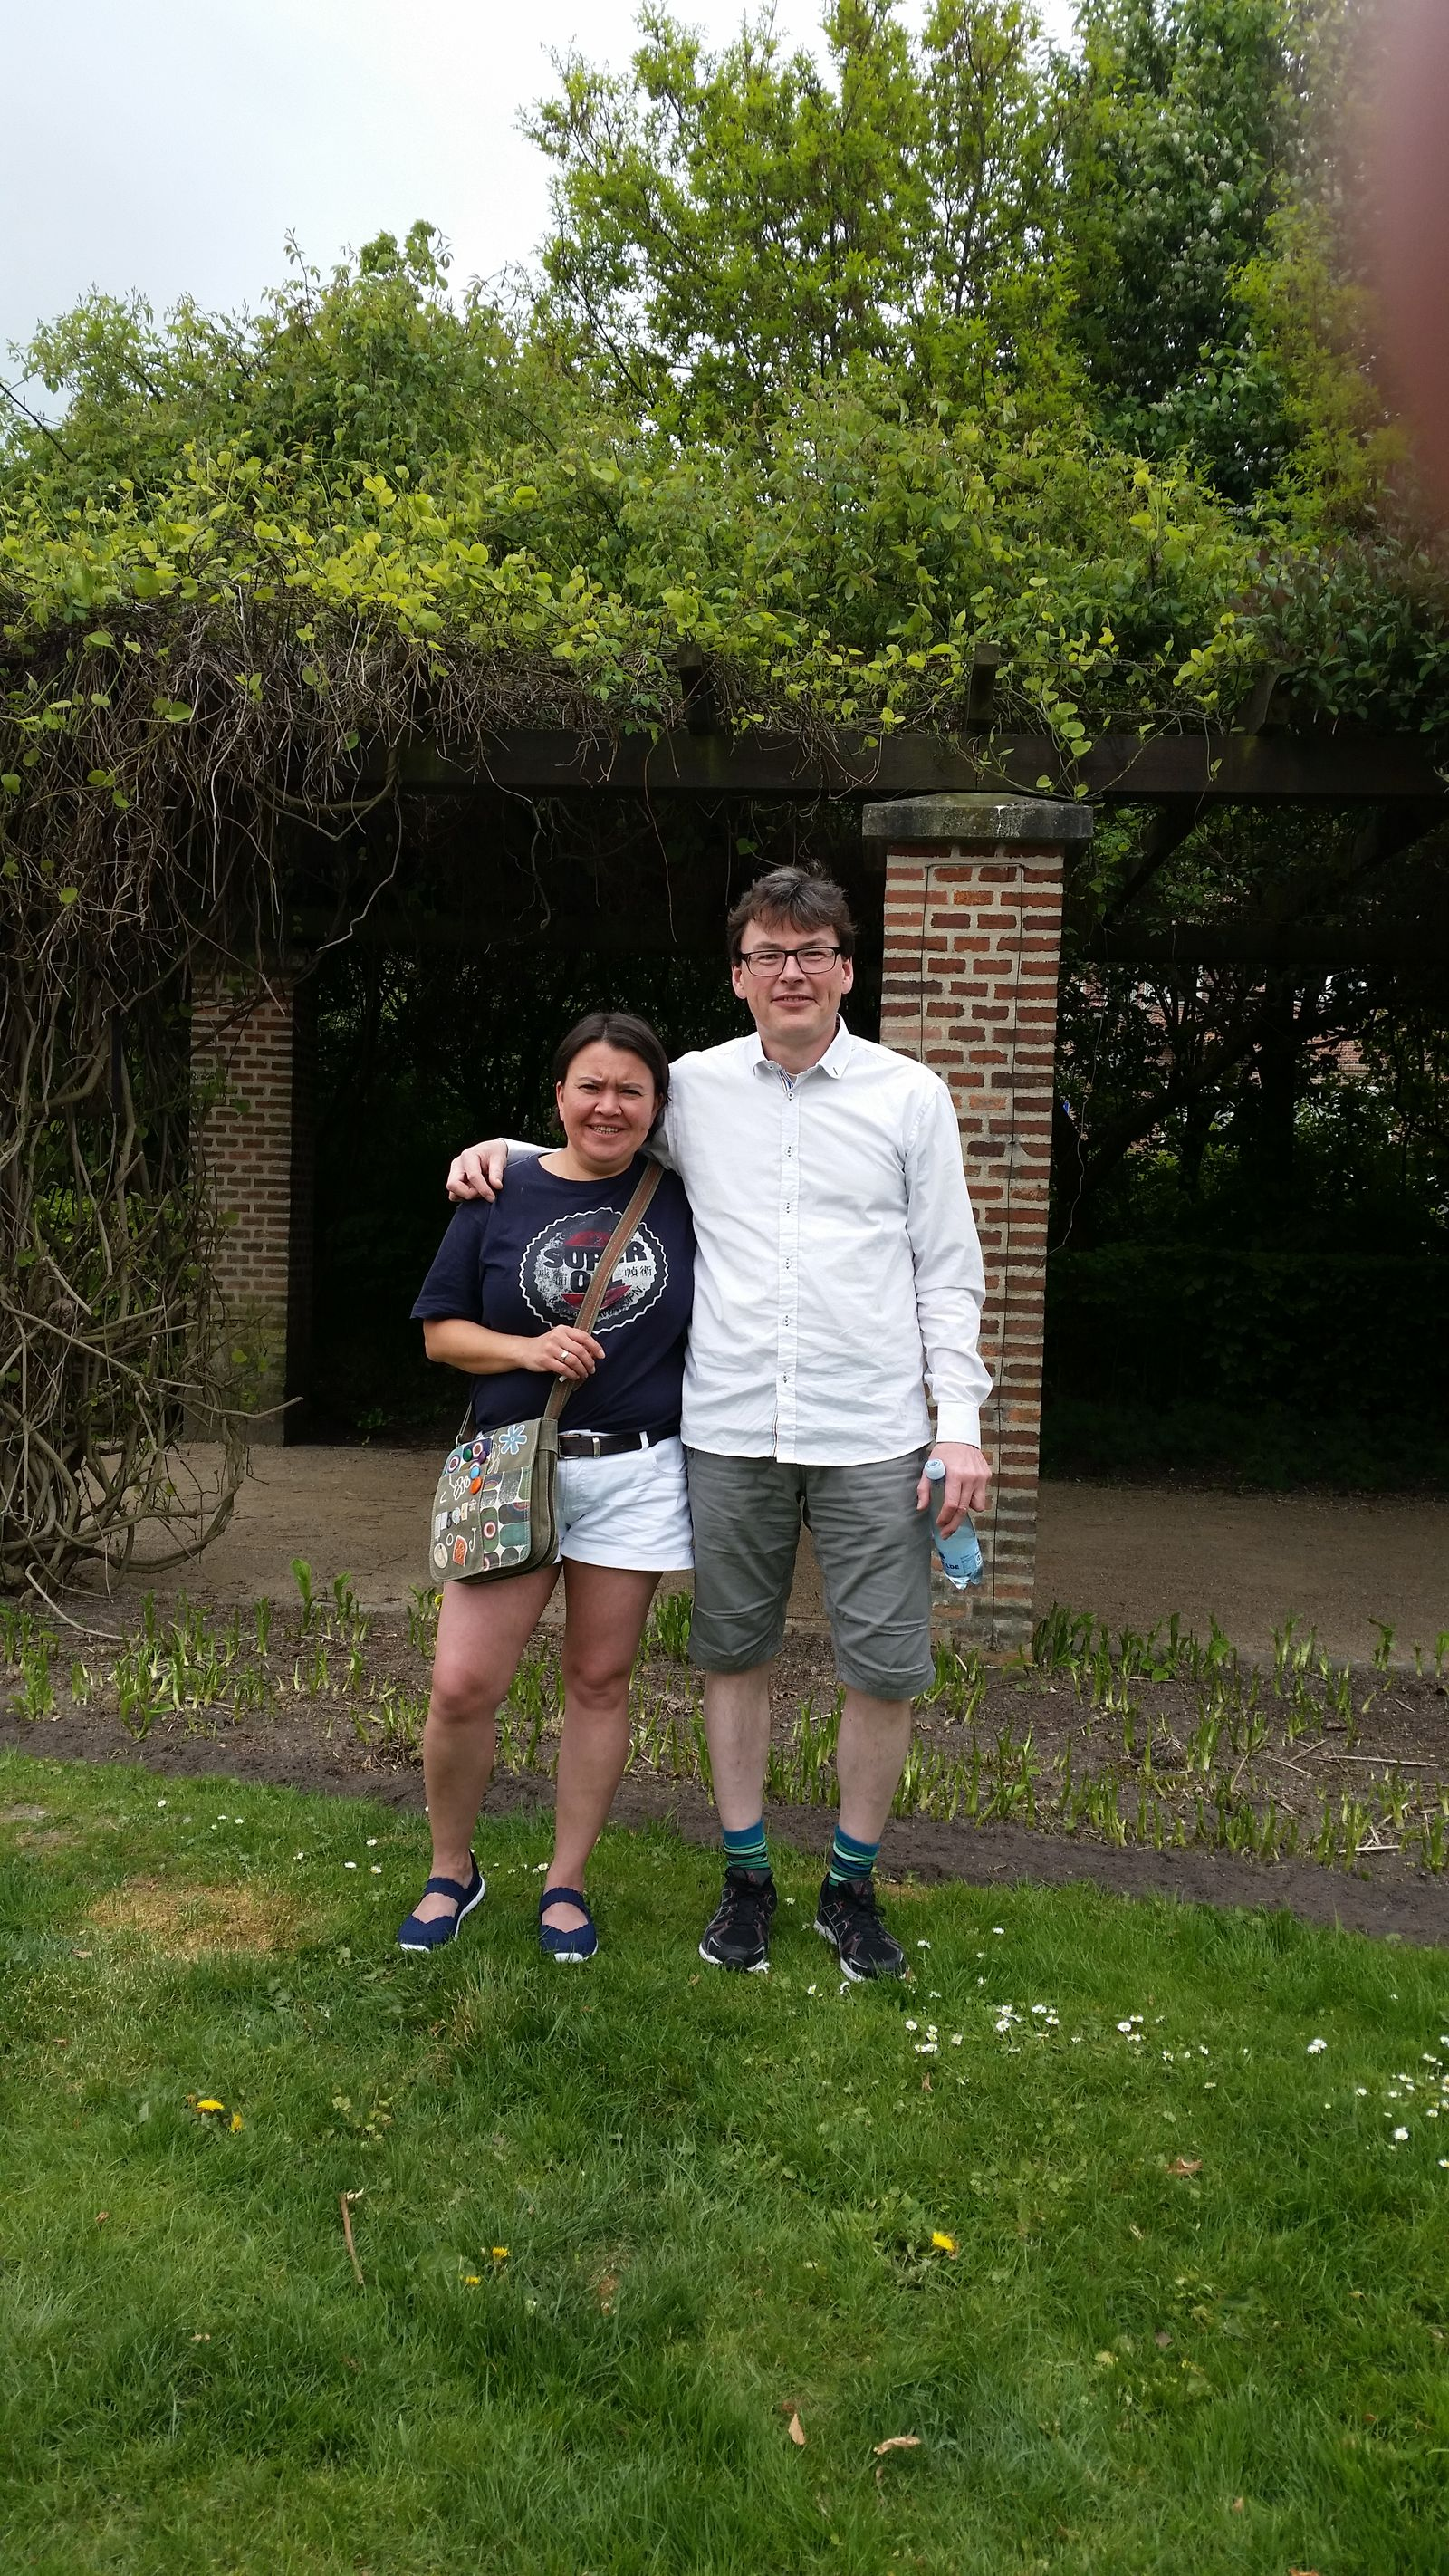 2016-05-19-1520_-_anna_hessler__soeren_labansen_2